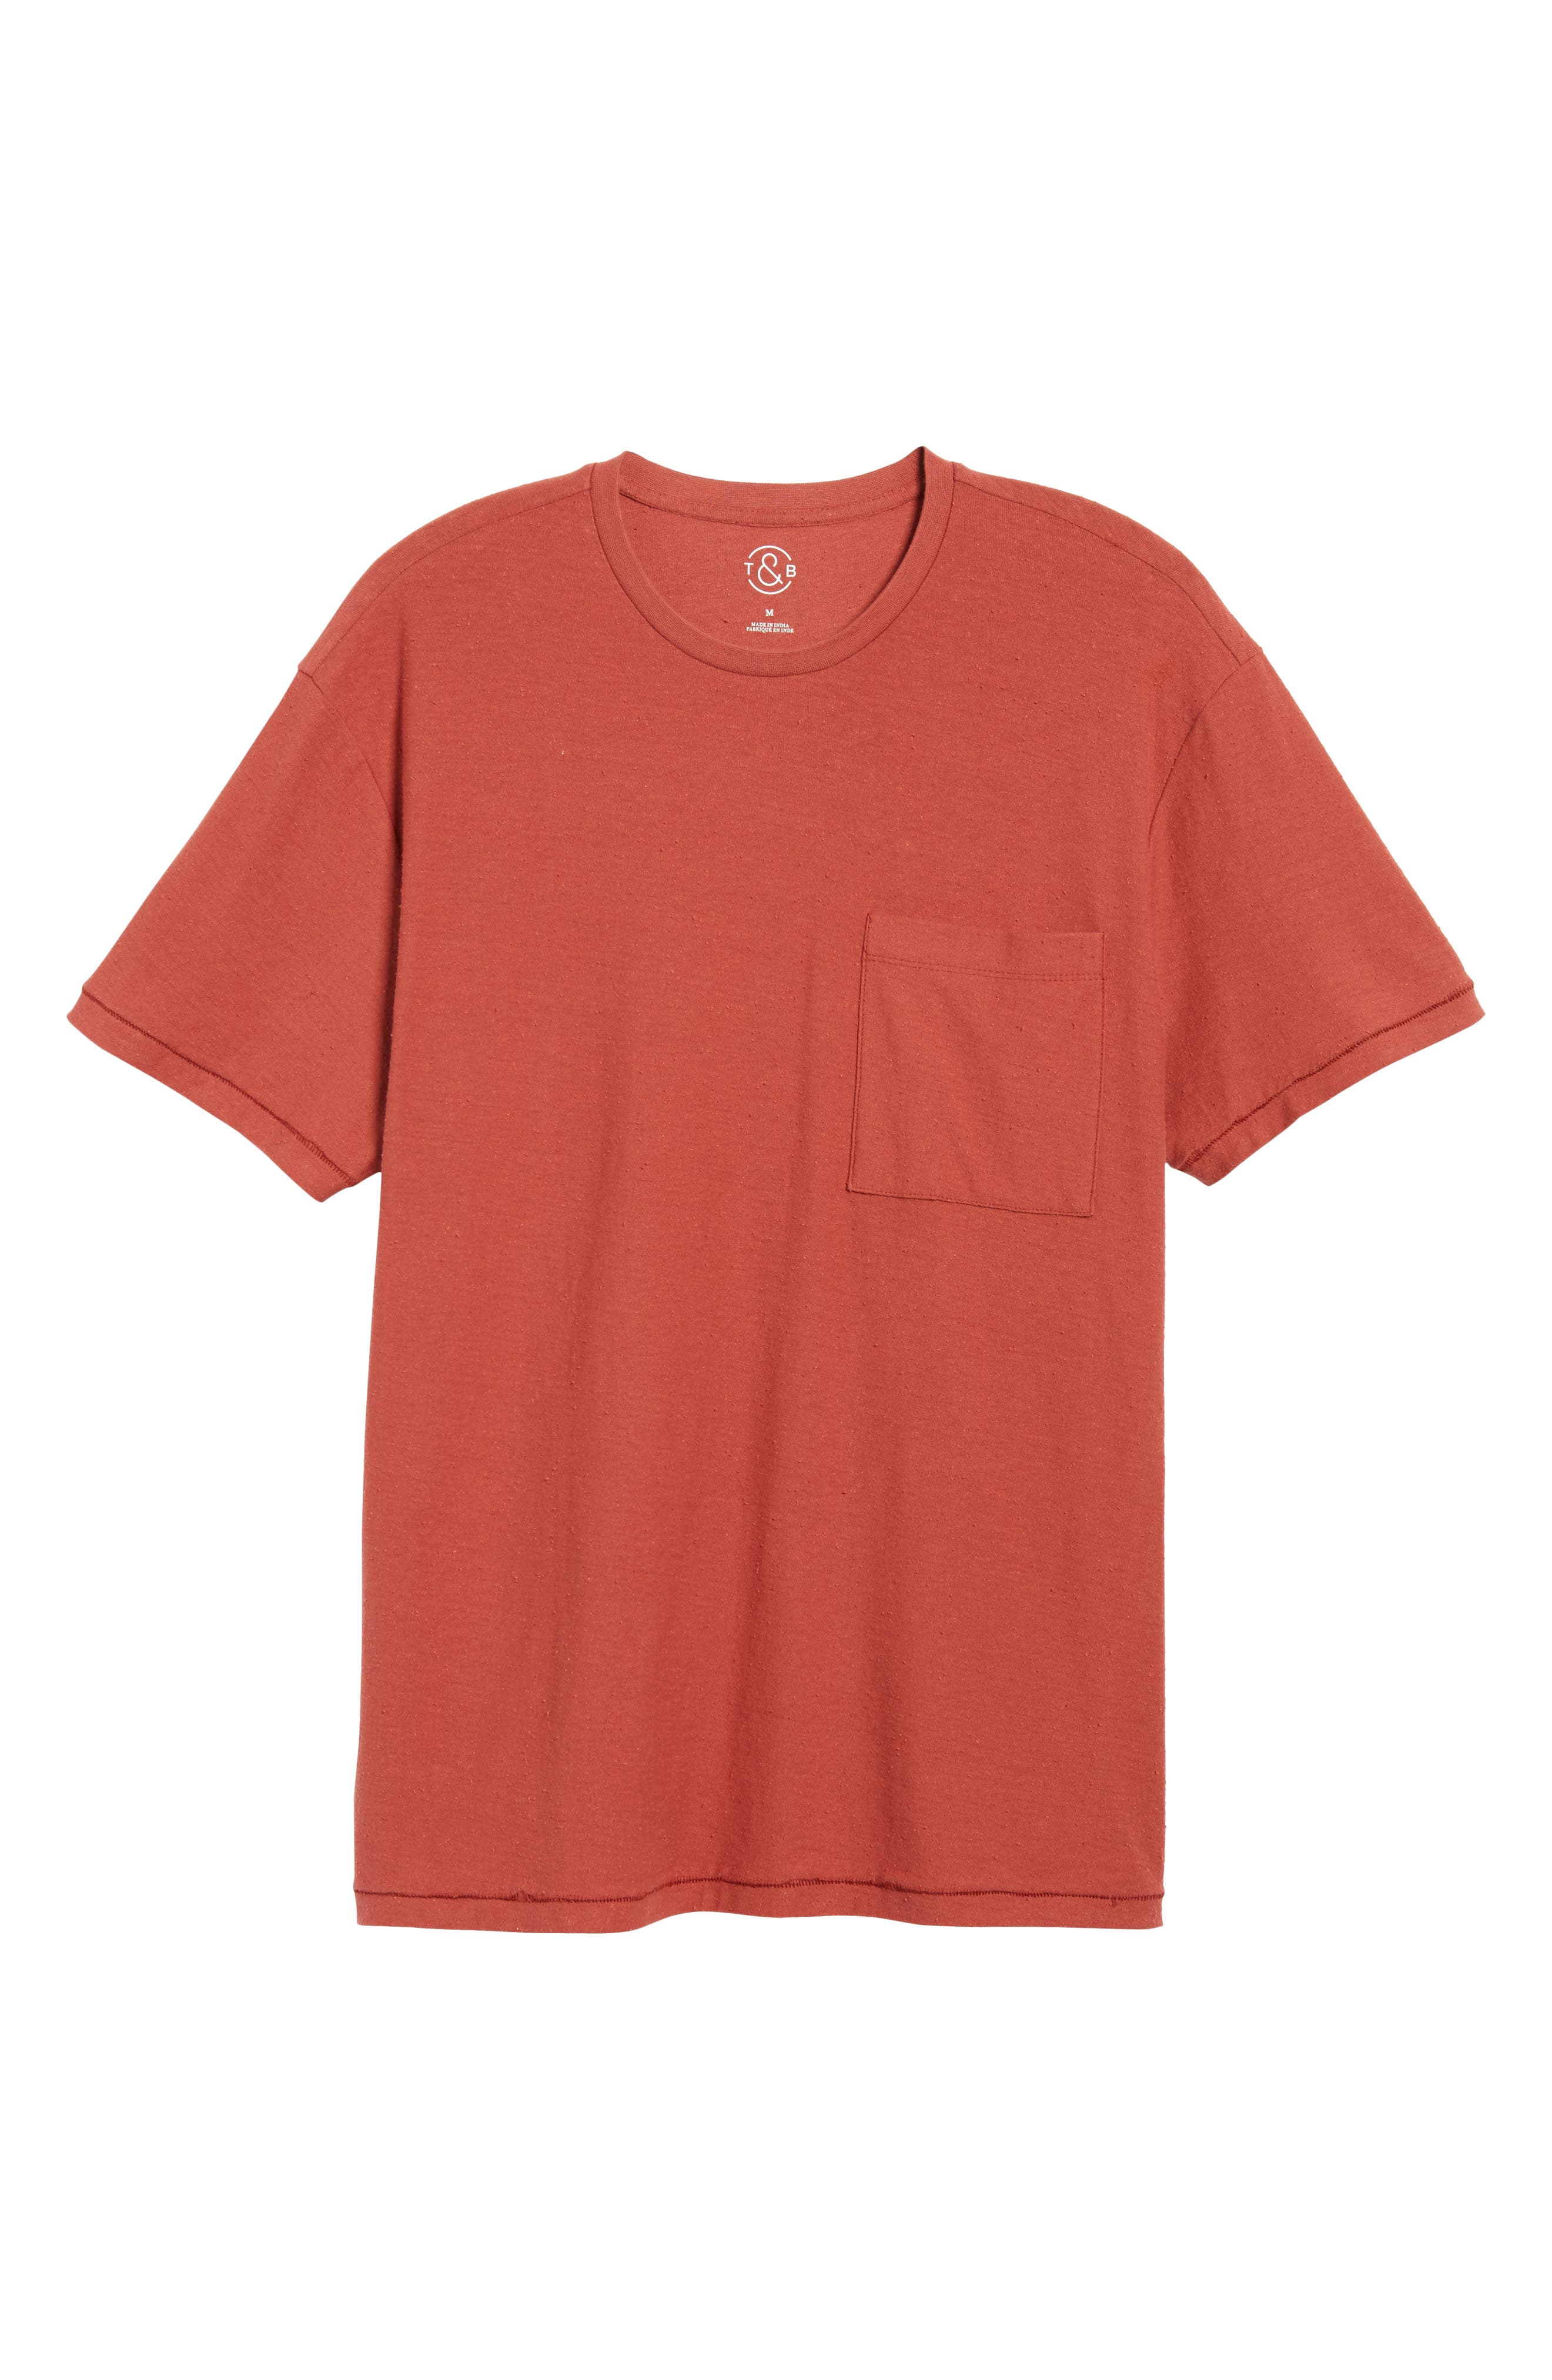 Nep Cotton Pocket T-Shirt,                             Alternate thumbnail 6, color,                             221